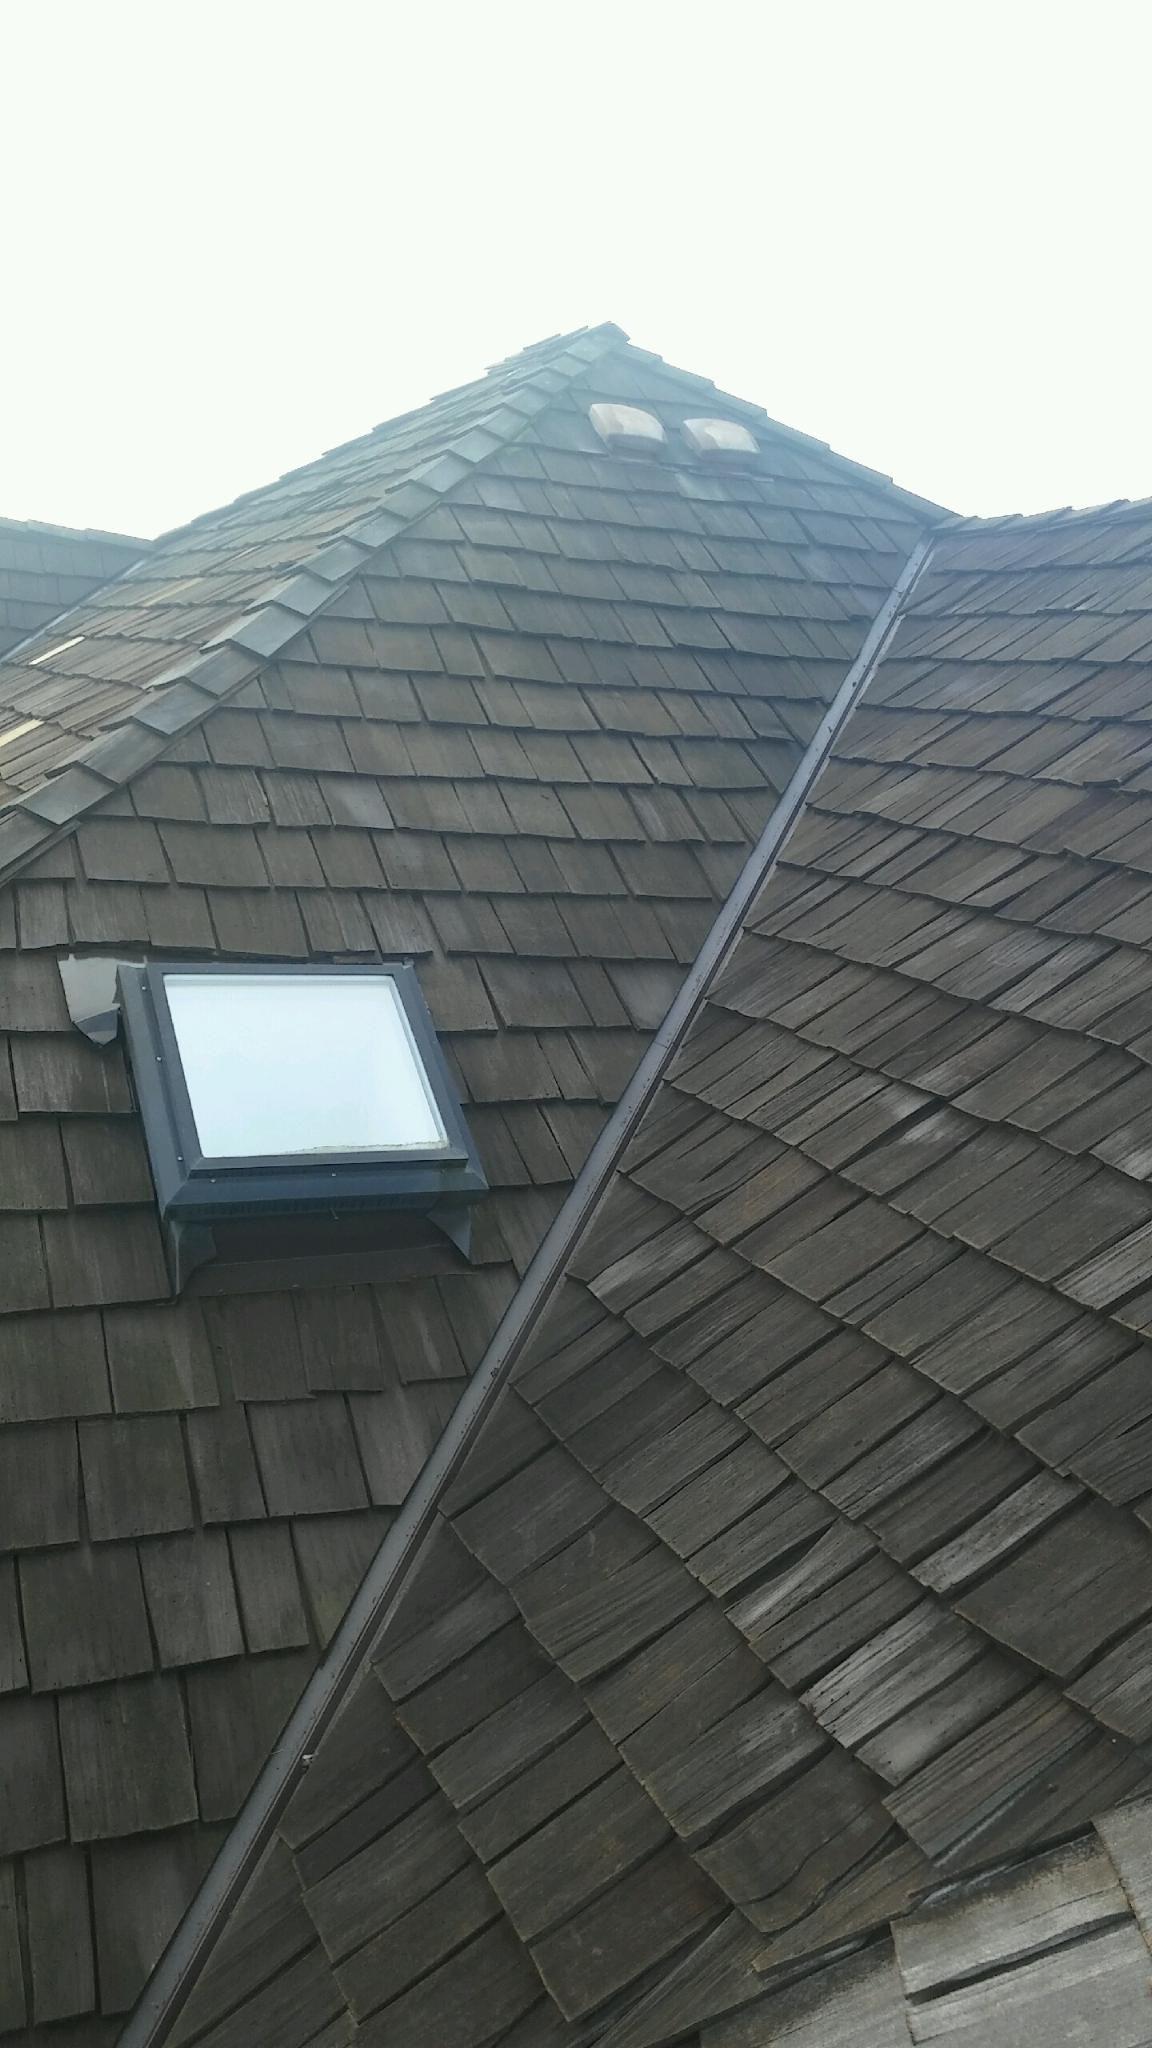 Cedar Shake Roof Maintenance Repair Vancouver Wa By Northwest Roof Maintenance Dom